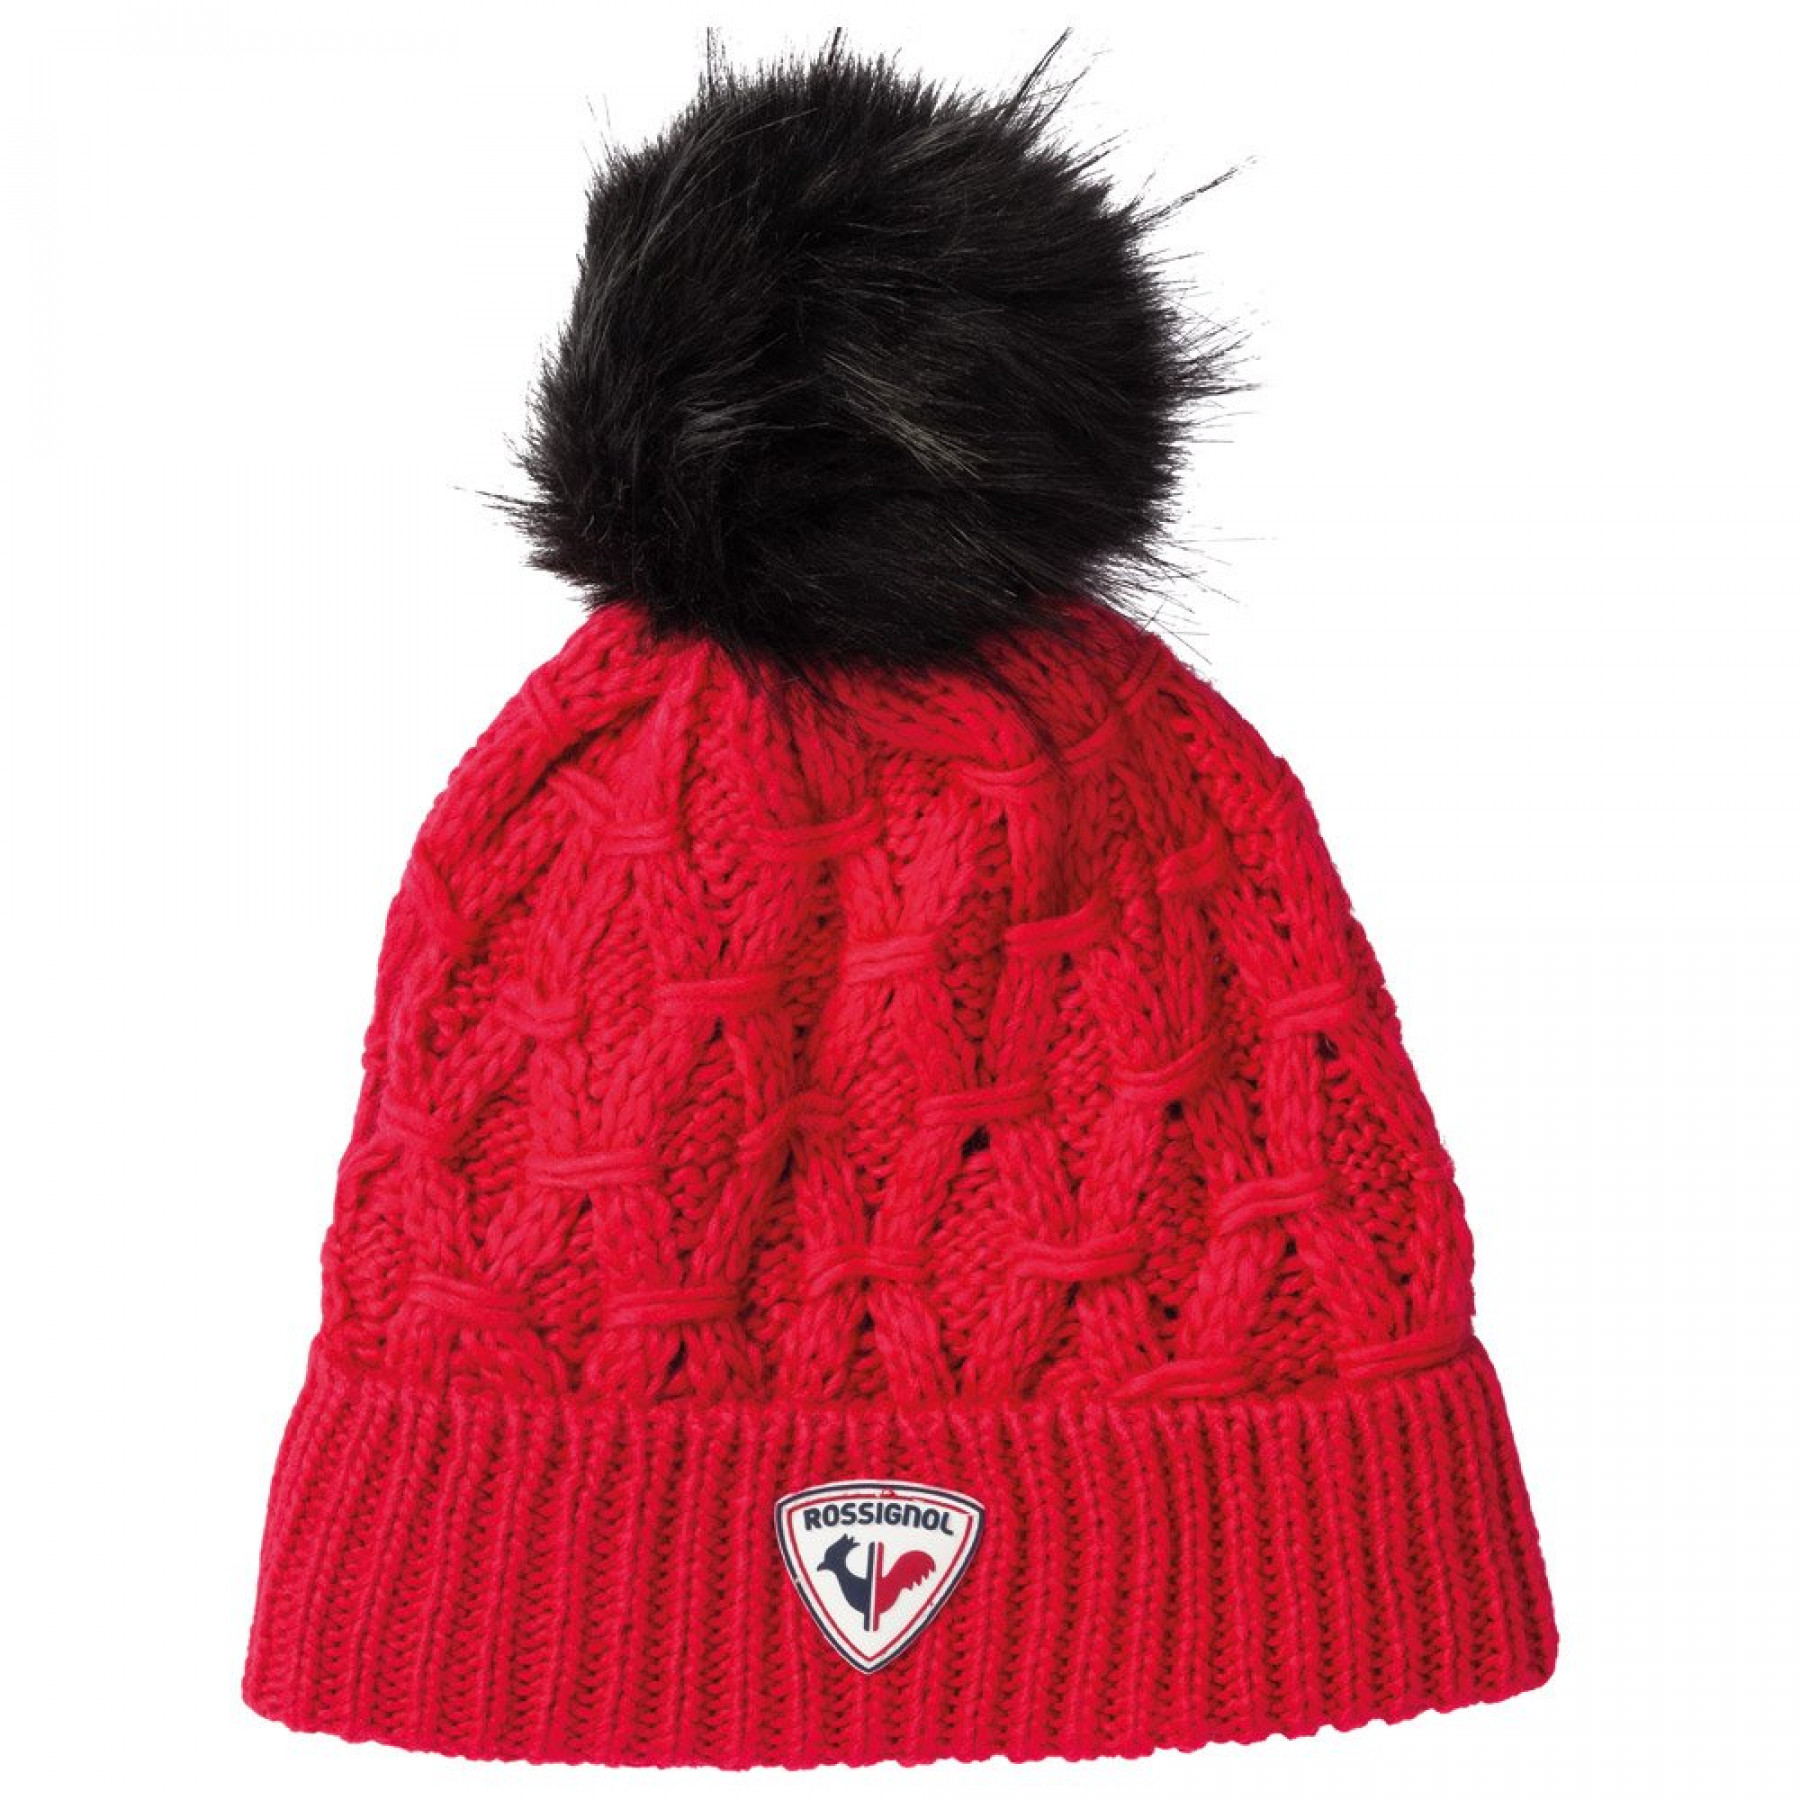 Women's hat Rossignol L3 Yuna